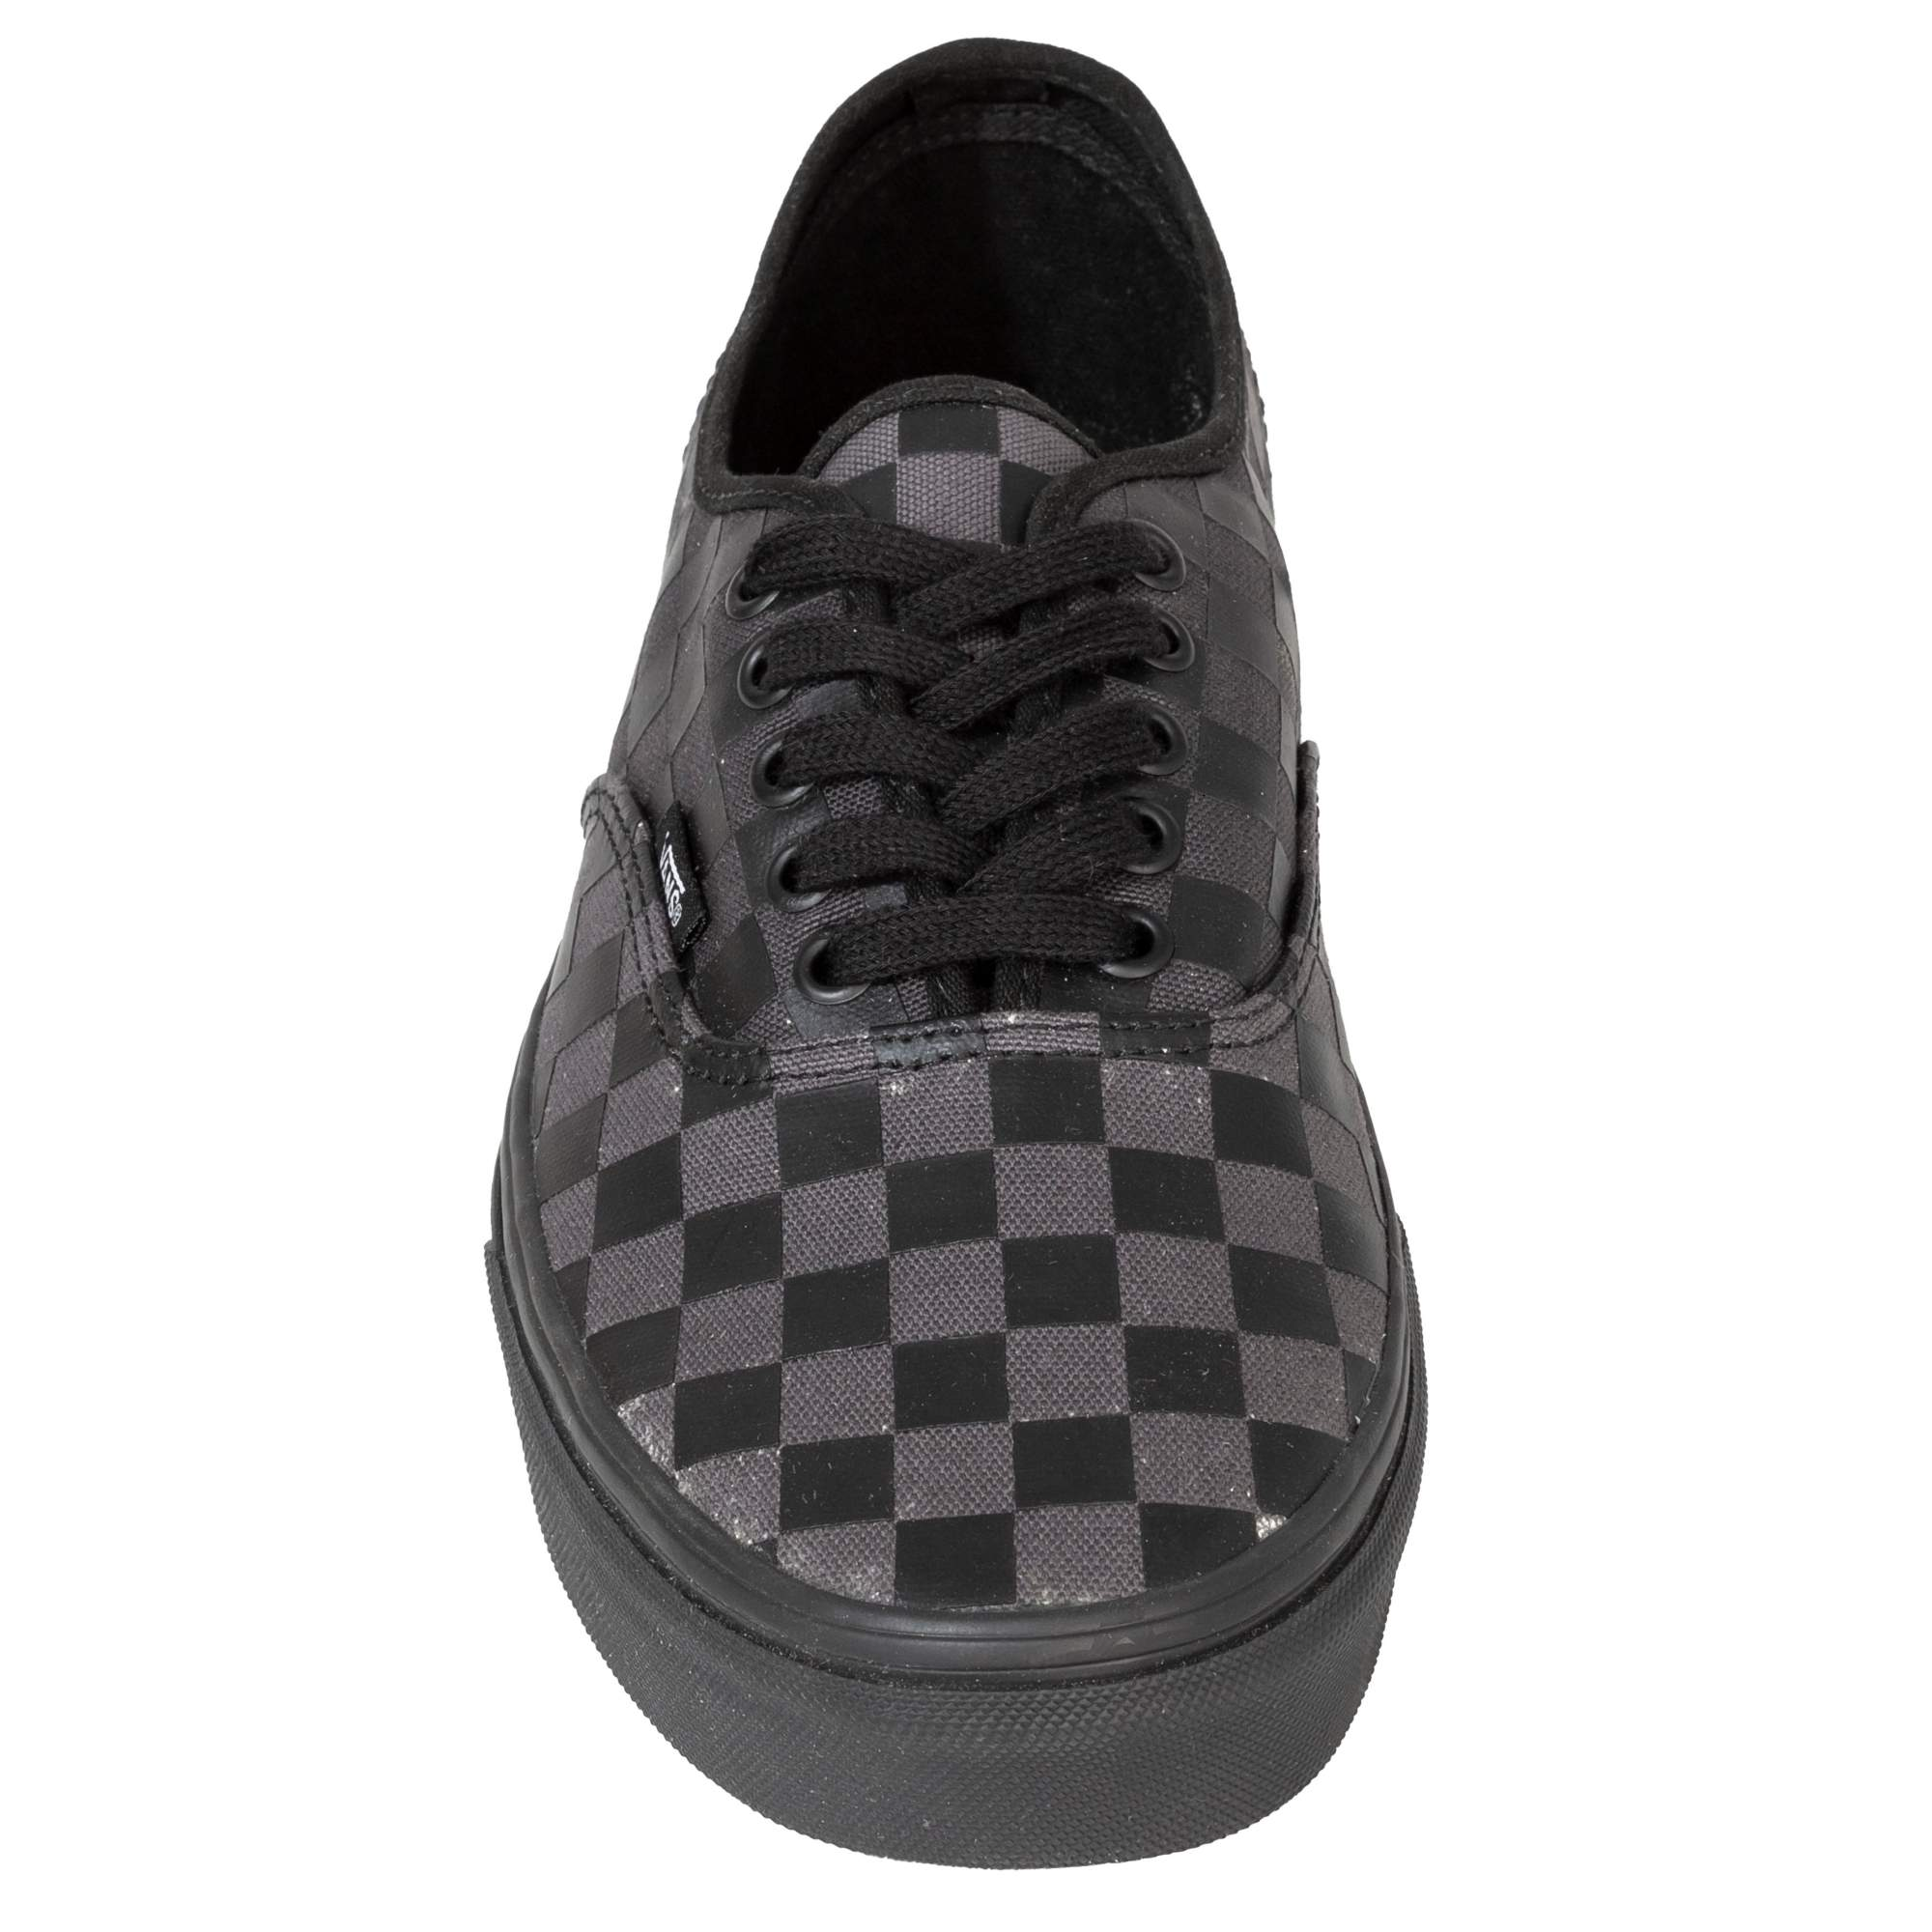 Tênis Vans Authentic Checkerboard Preto